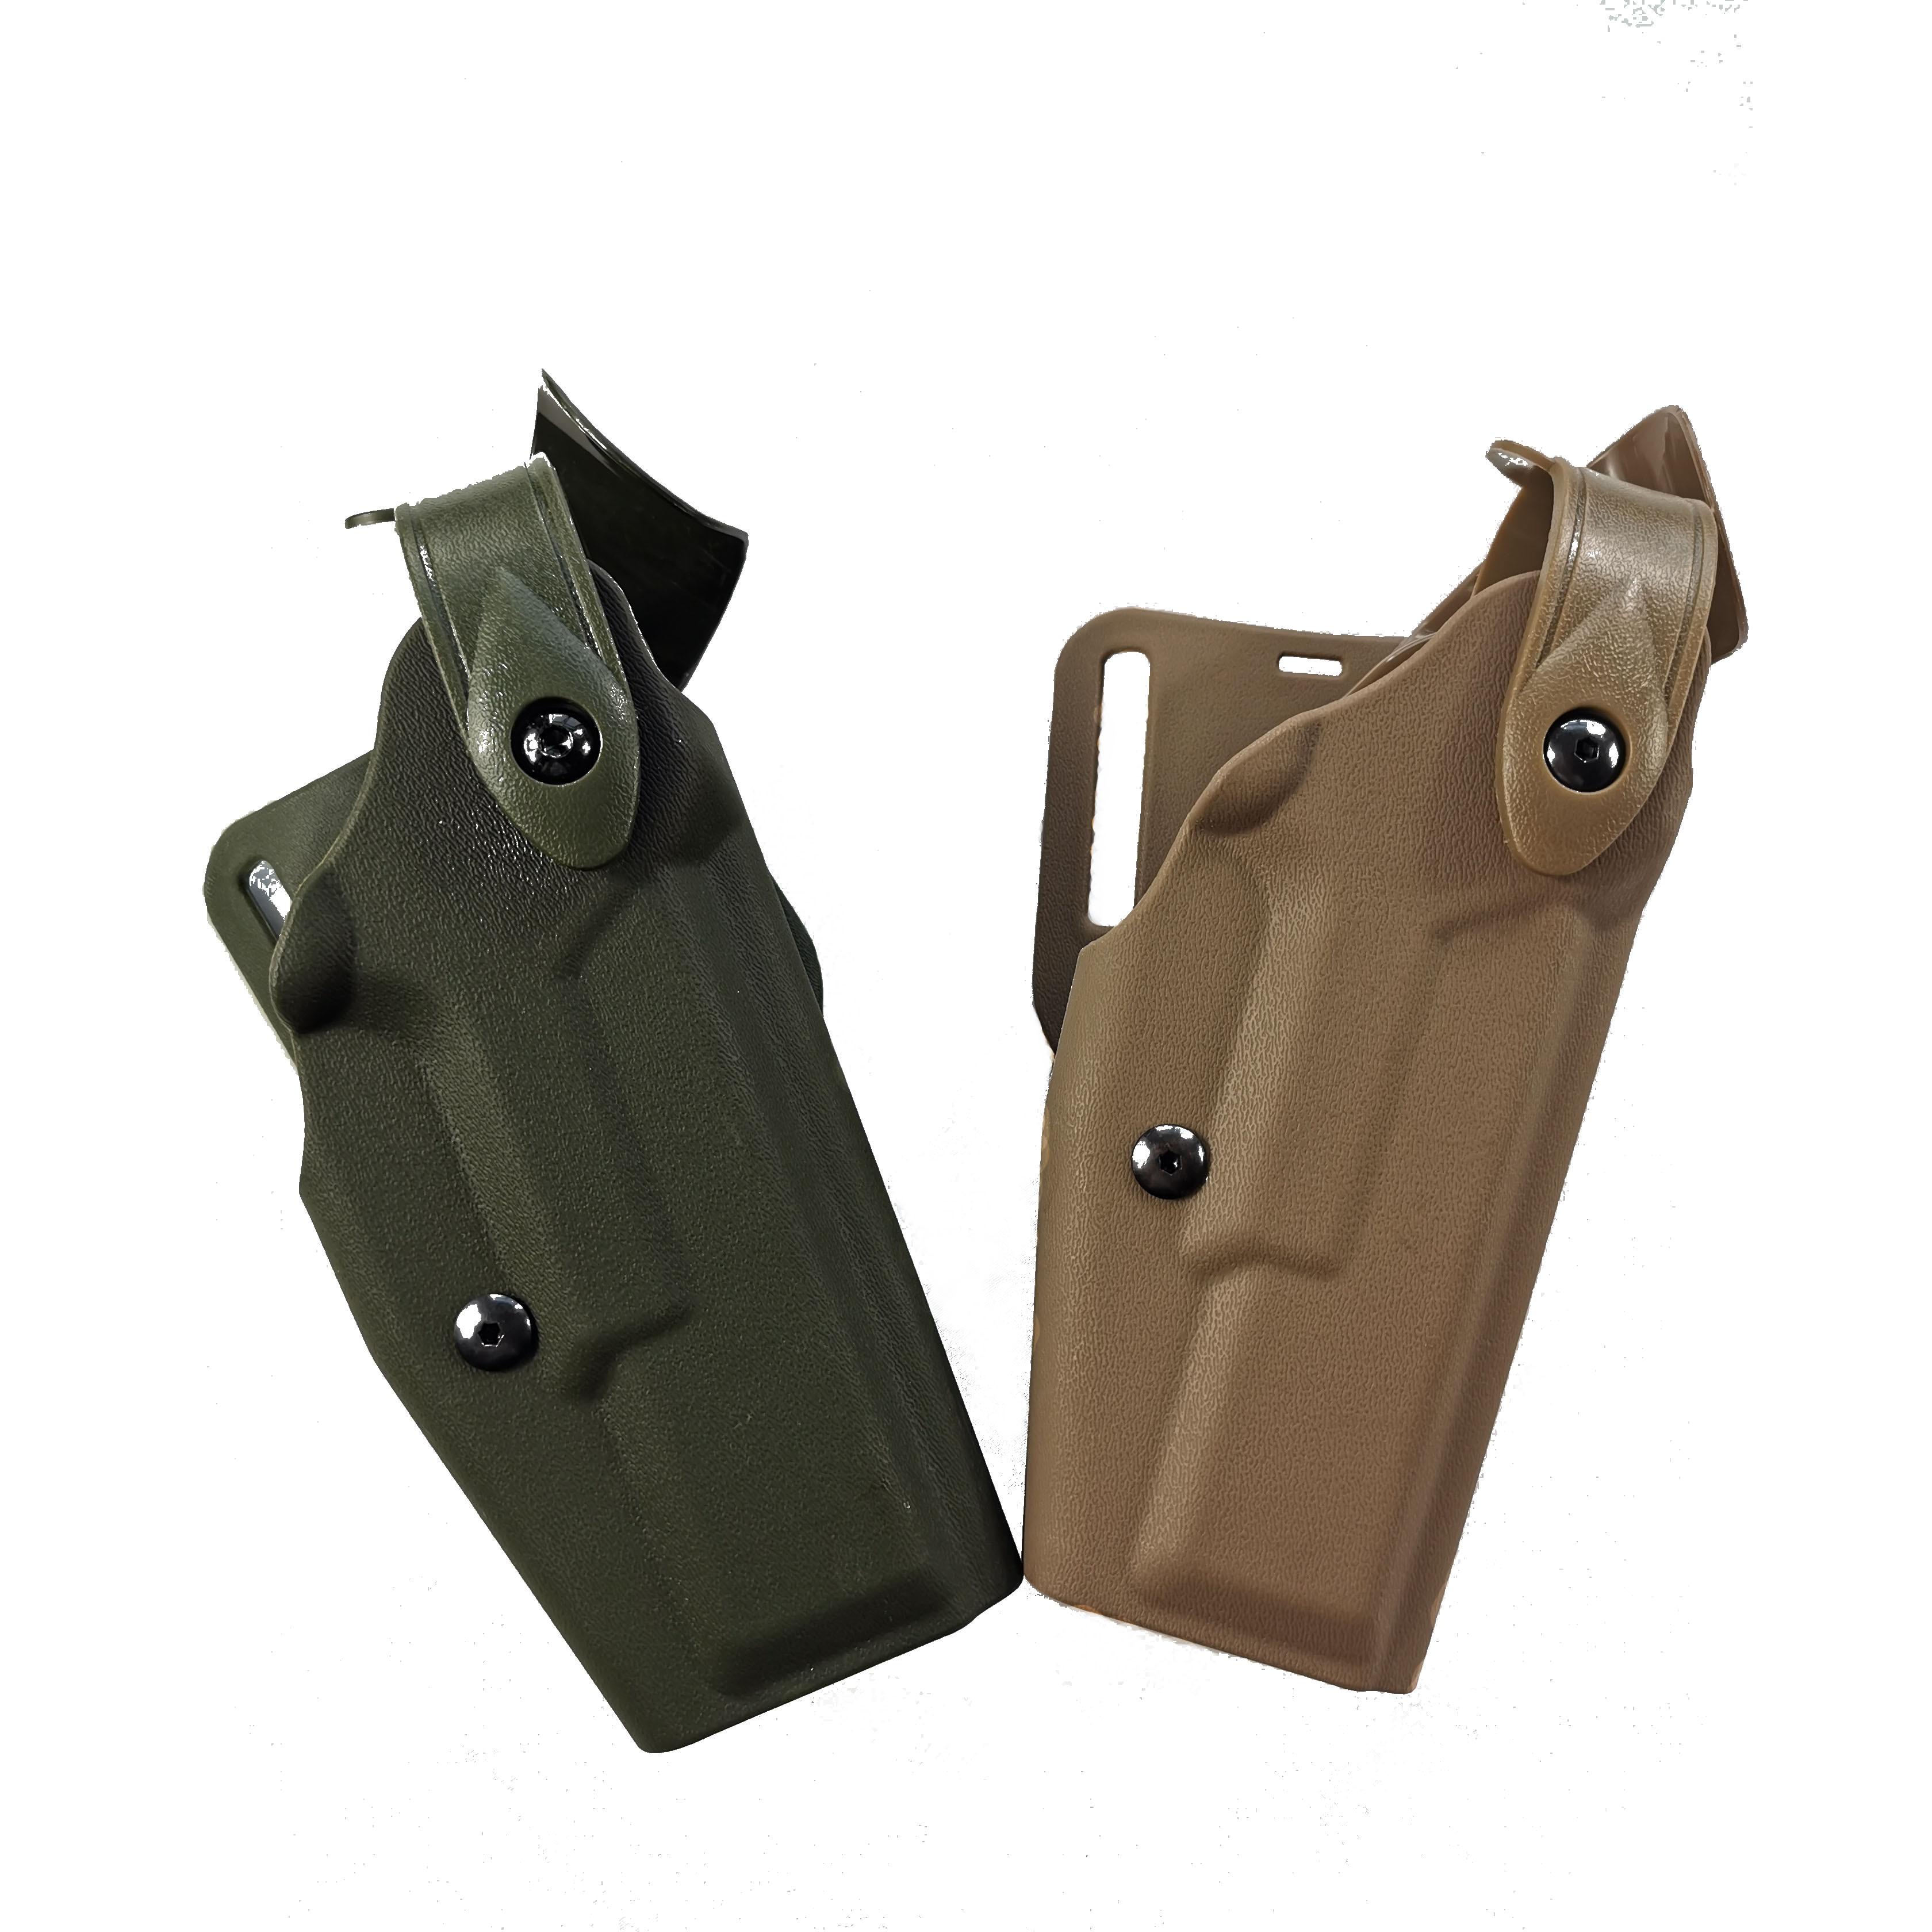 Safariland Tactical Polyurethane Glockck Belt Holster Gl0ck Pistol Waist Holster Glock 17 19 22 23 31 32 Airsoft Gun Holster in Holsters from Sports Entertainment